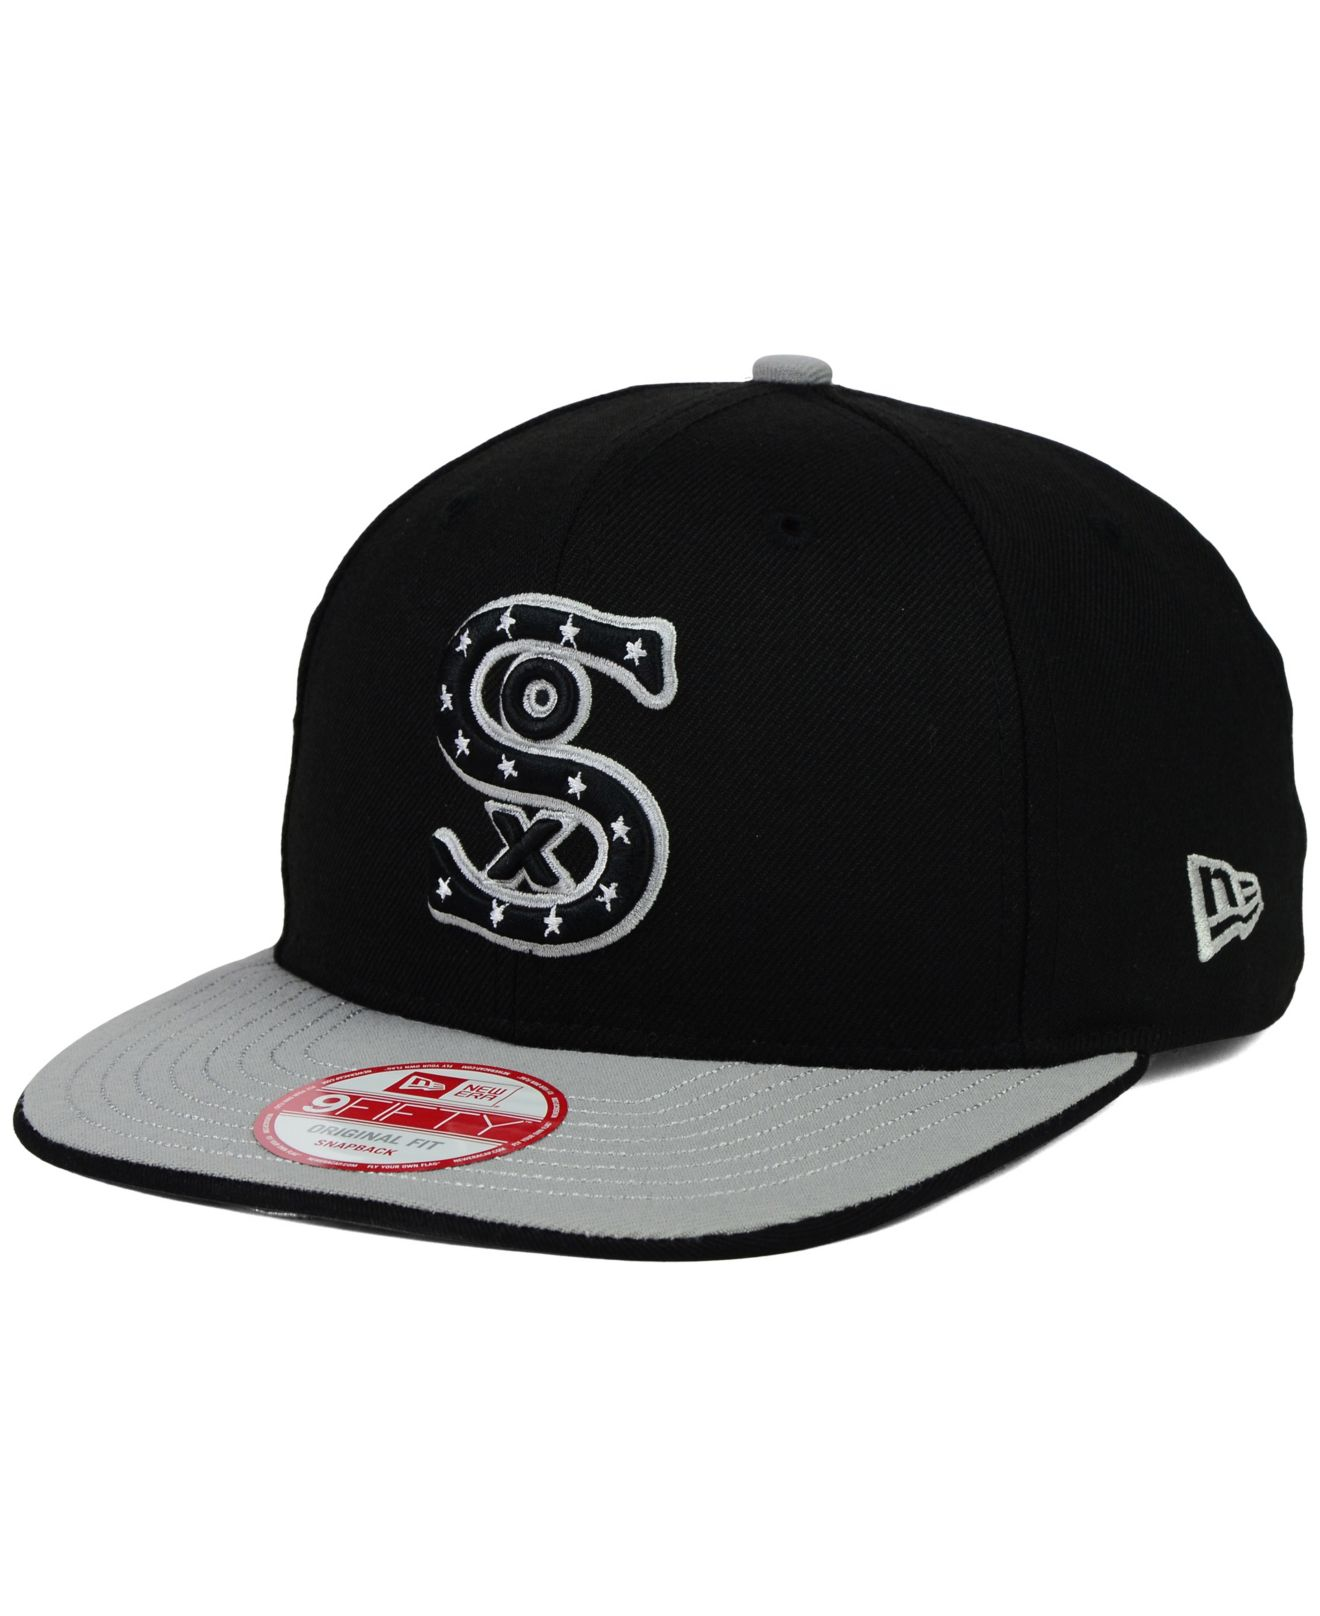 4b1af80ae444a0 ... get lyst ktz chicago white sox under snapper 9fifty snapback cap in  31608 8cb4b